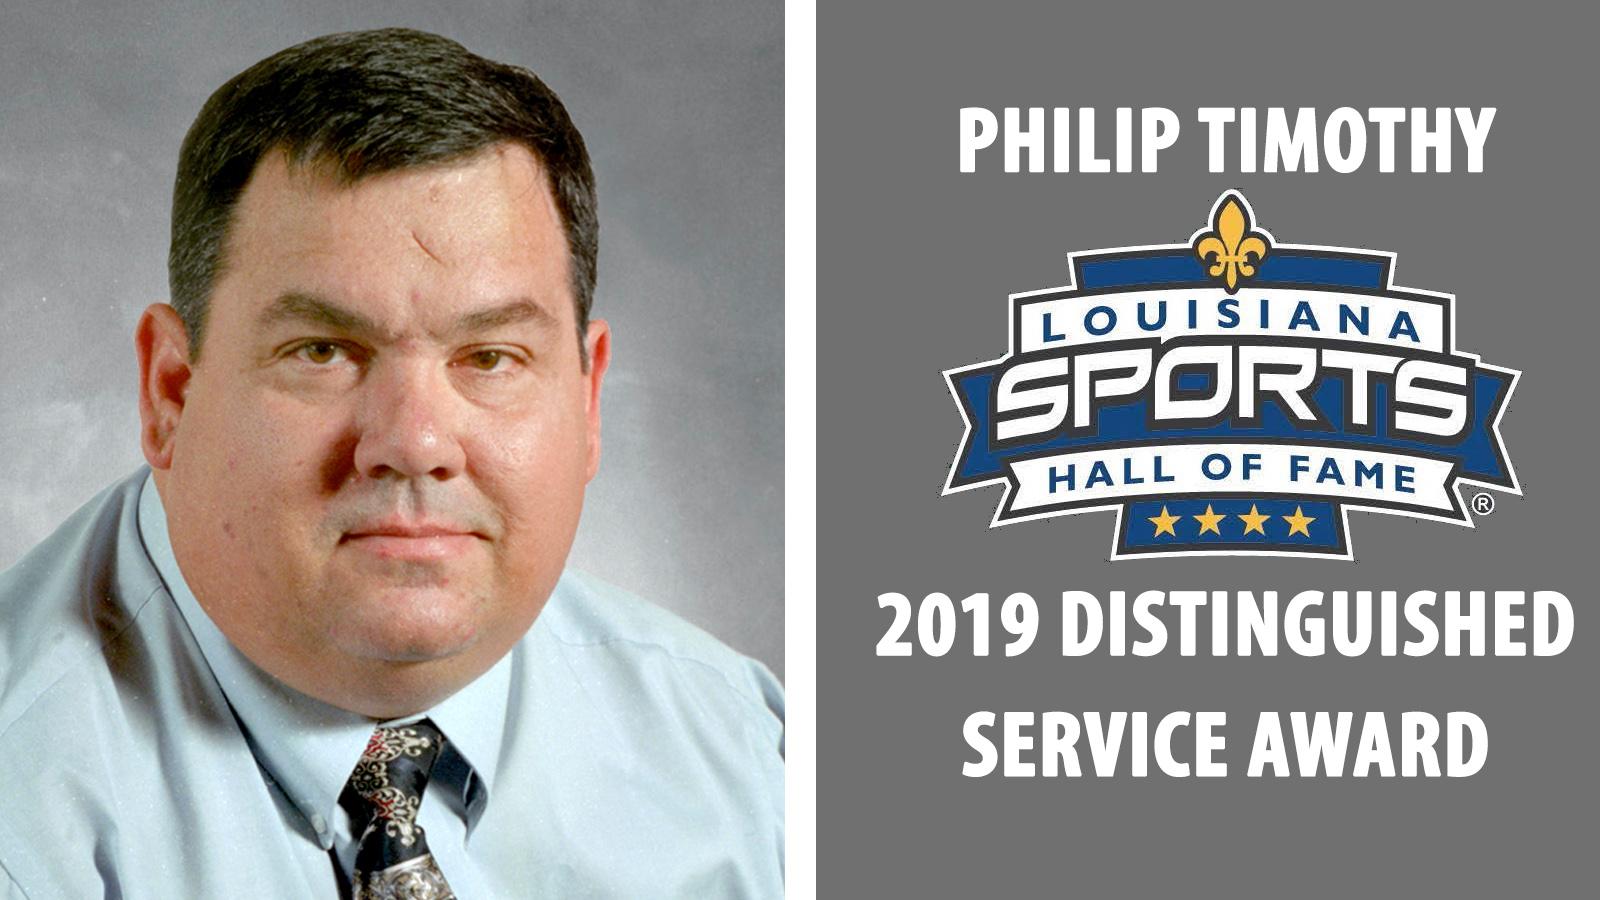 Philip Timothy's talent, tenacity, passion made him Louisiana Sports Hall-worthy